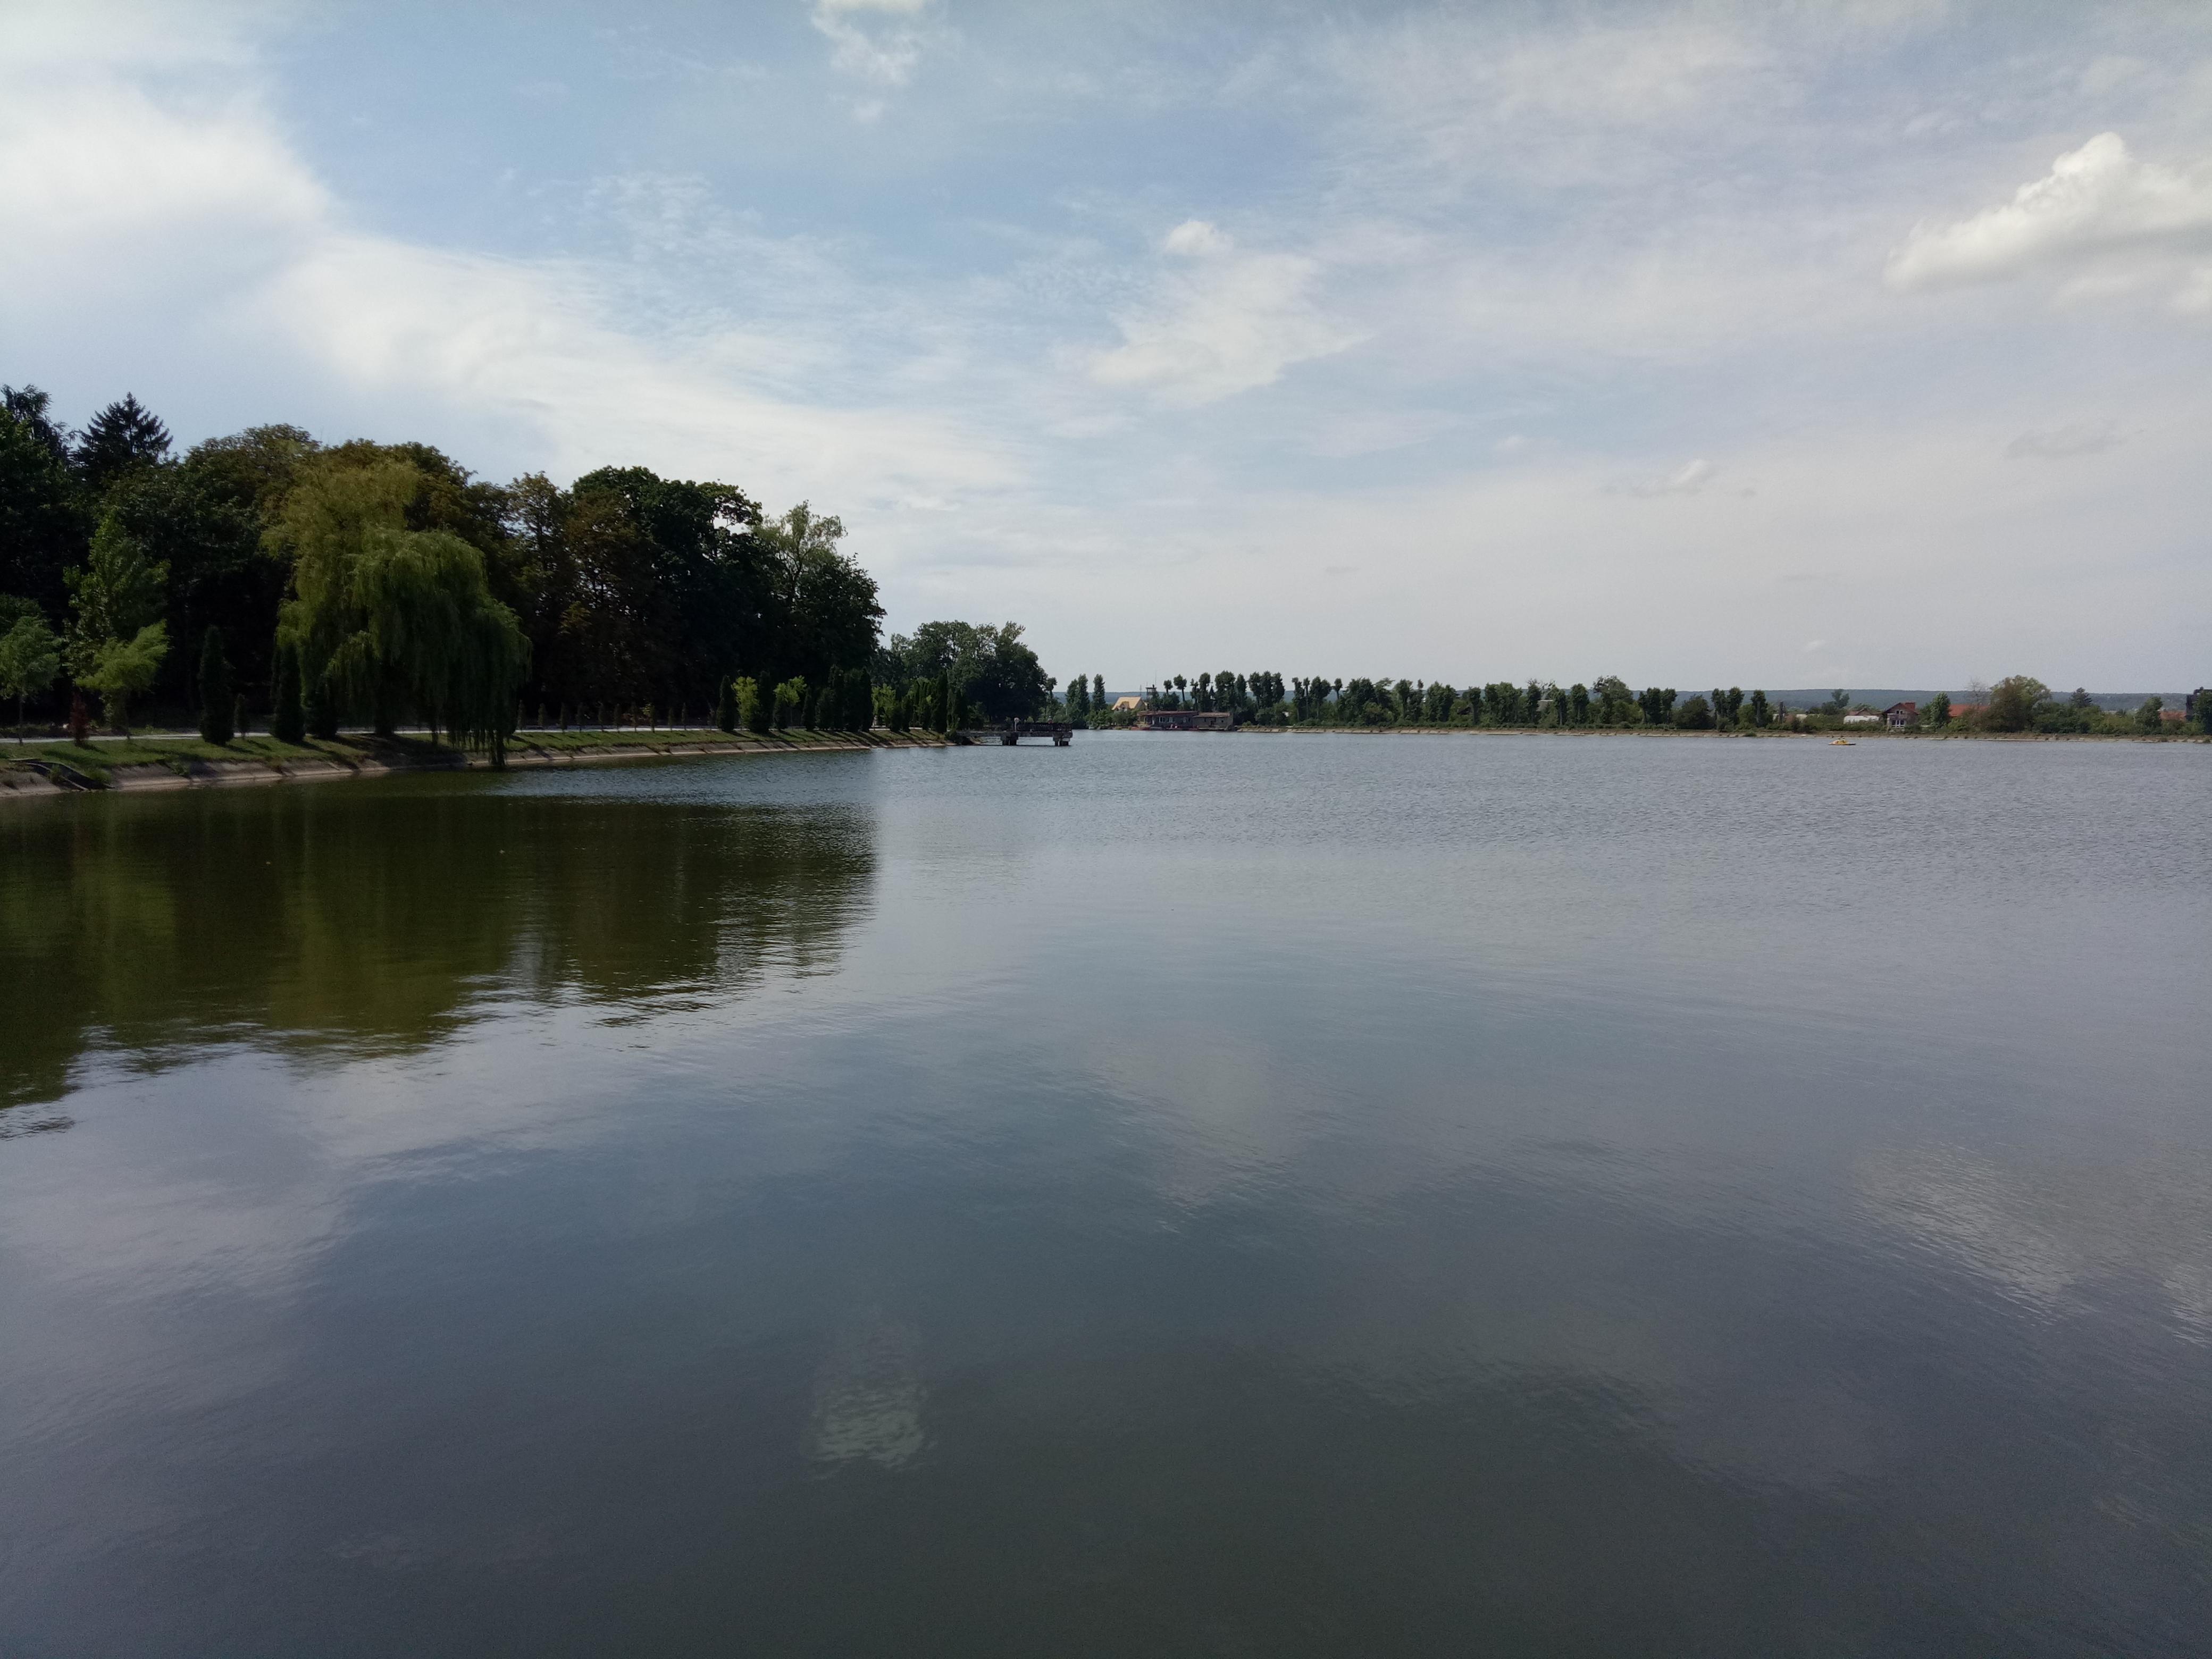 Misʹke Ozero (Міське озеро) is man-made Lake or so-called Stanislavsky Sea. It was established in 1955